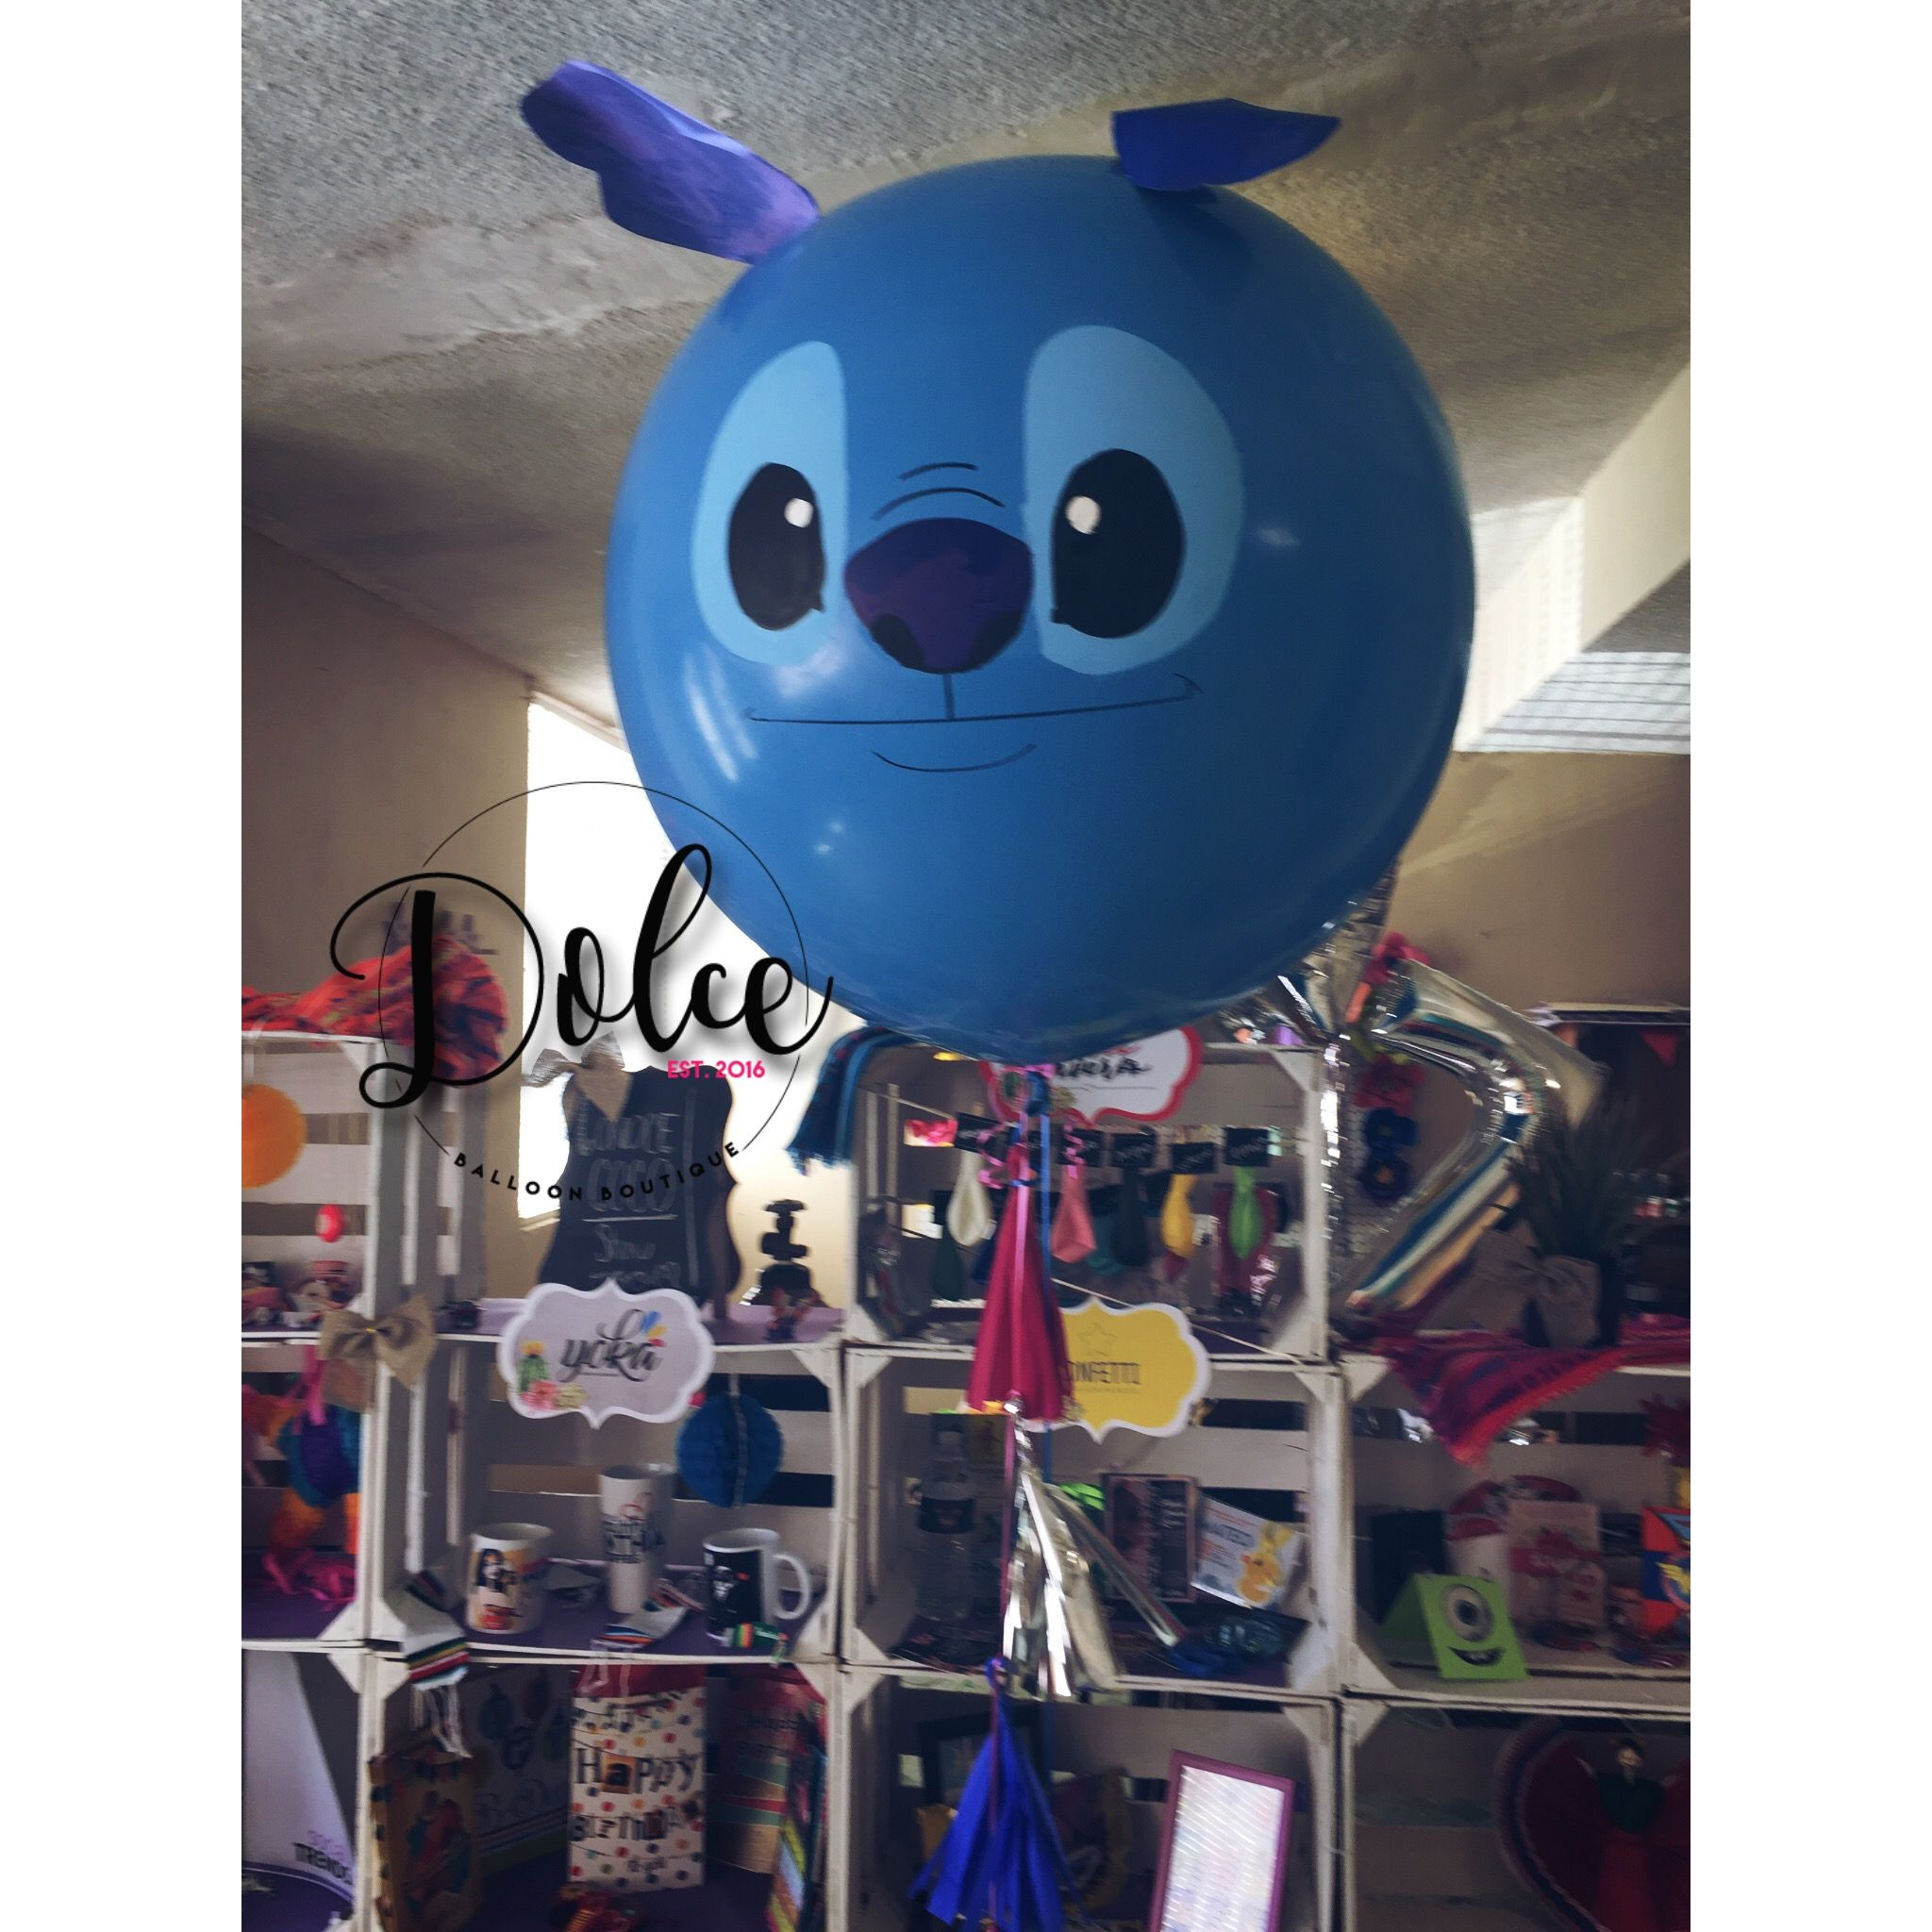 Globo Gigante Con Dise 241 O De Stitch 161 Dilo Con Globos Y